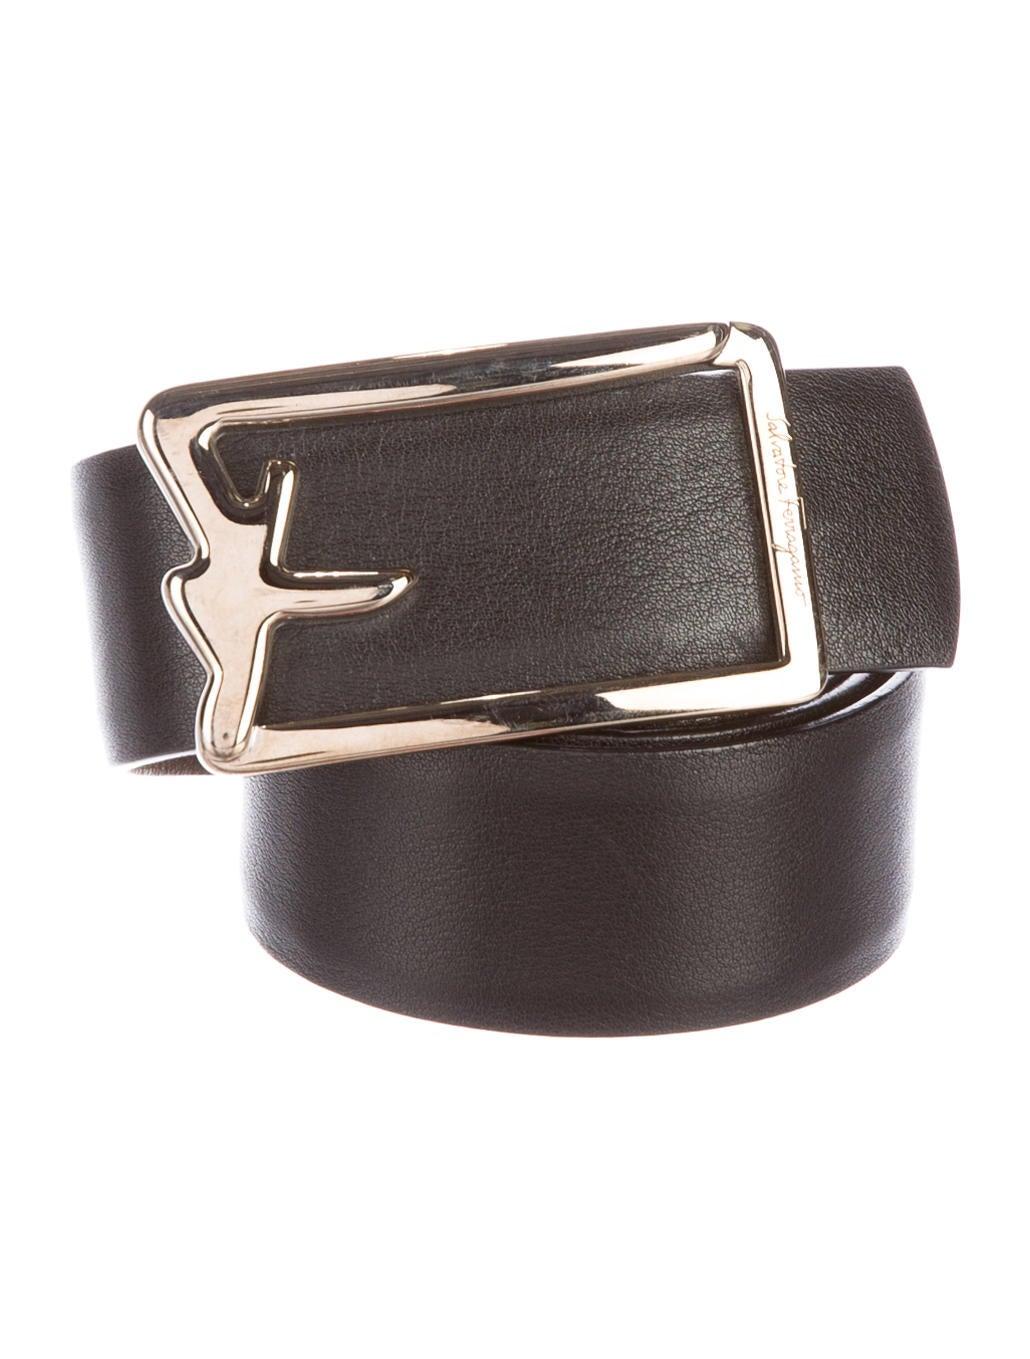 Salvatore Ferragamo Leather Buckle Belt - Accessories - SAL42972 - The ...